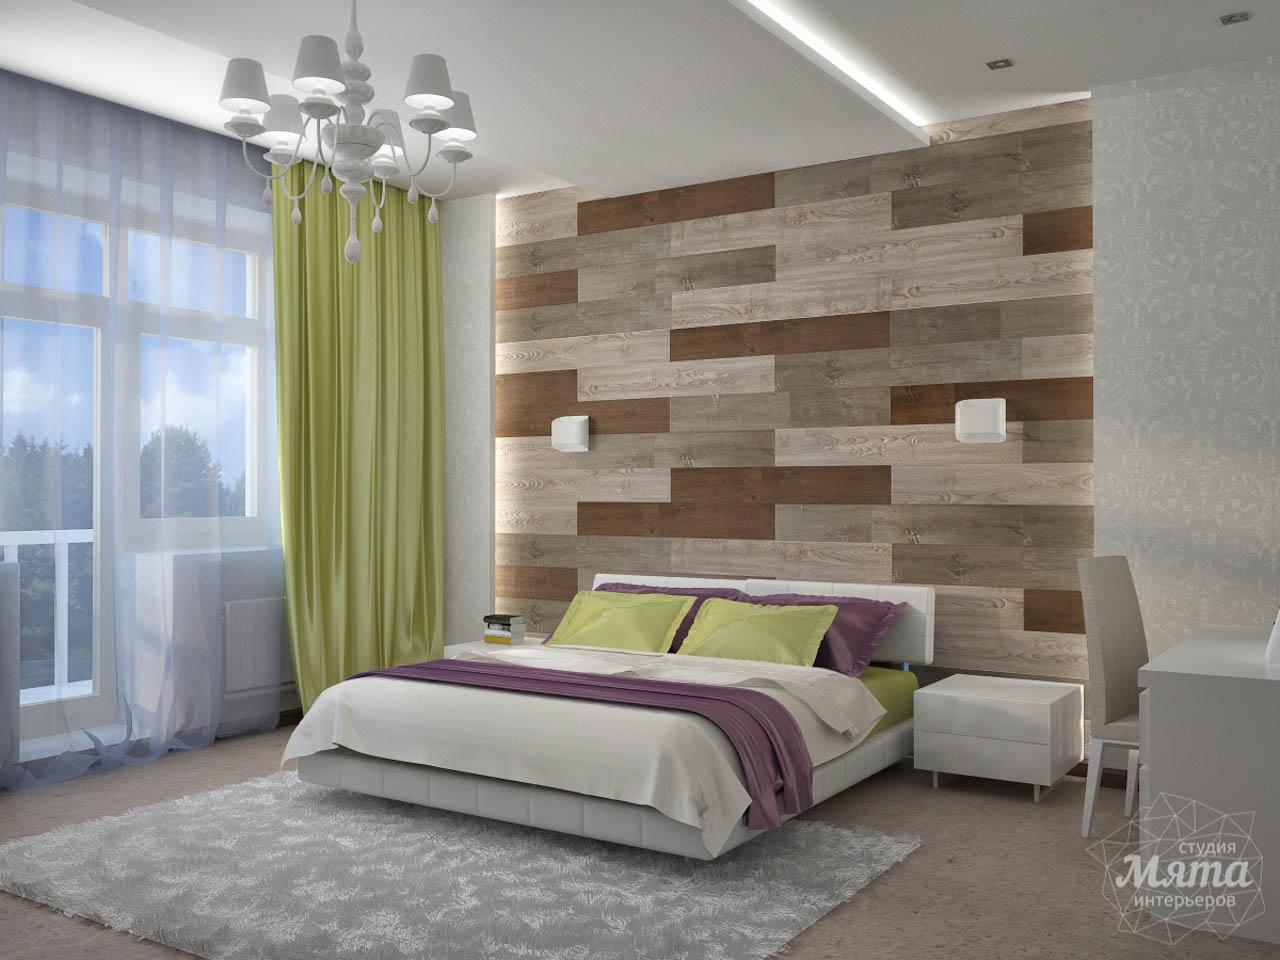 Дизайн проект интерьера коттеджа  в стиле минимализм по ул. Барвинка 15 img144328141